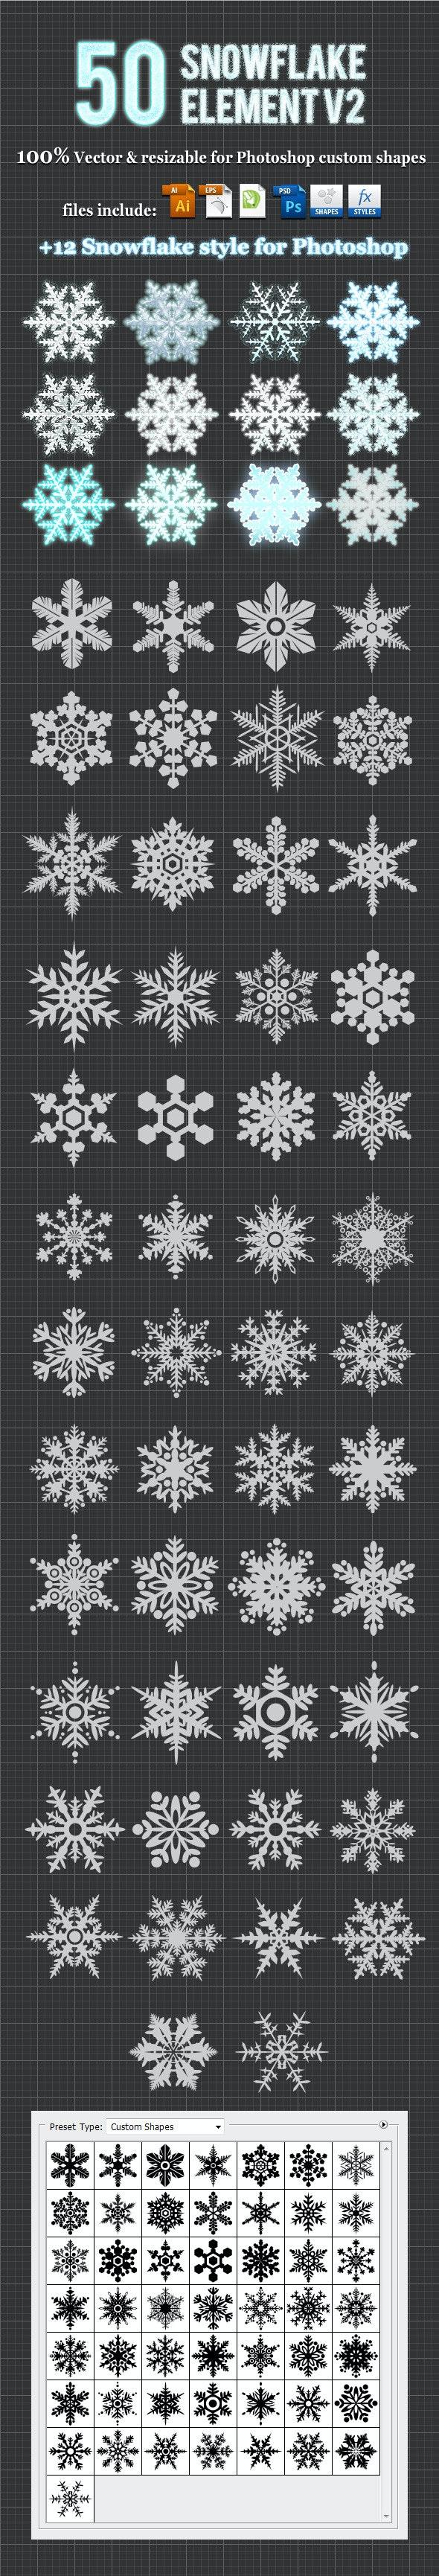 50Snowflake Element v2 Photoshop Custom Shapes - Miscellaneous Shapes